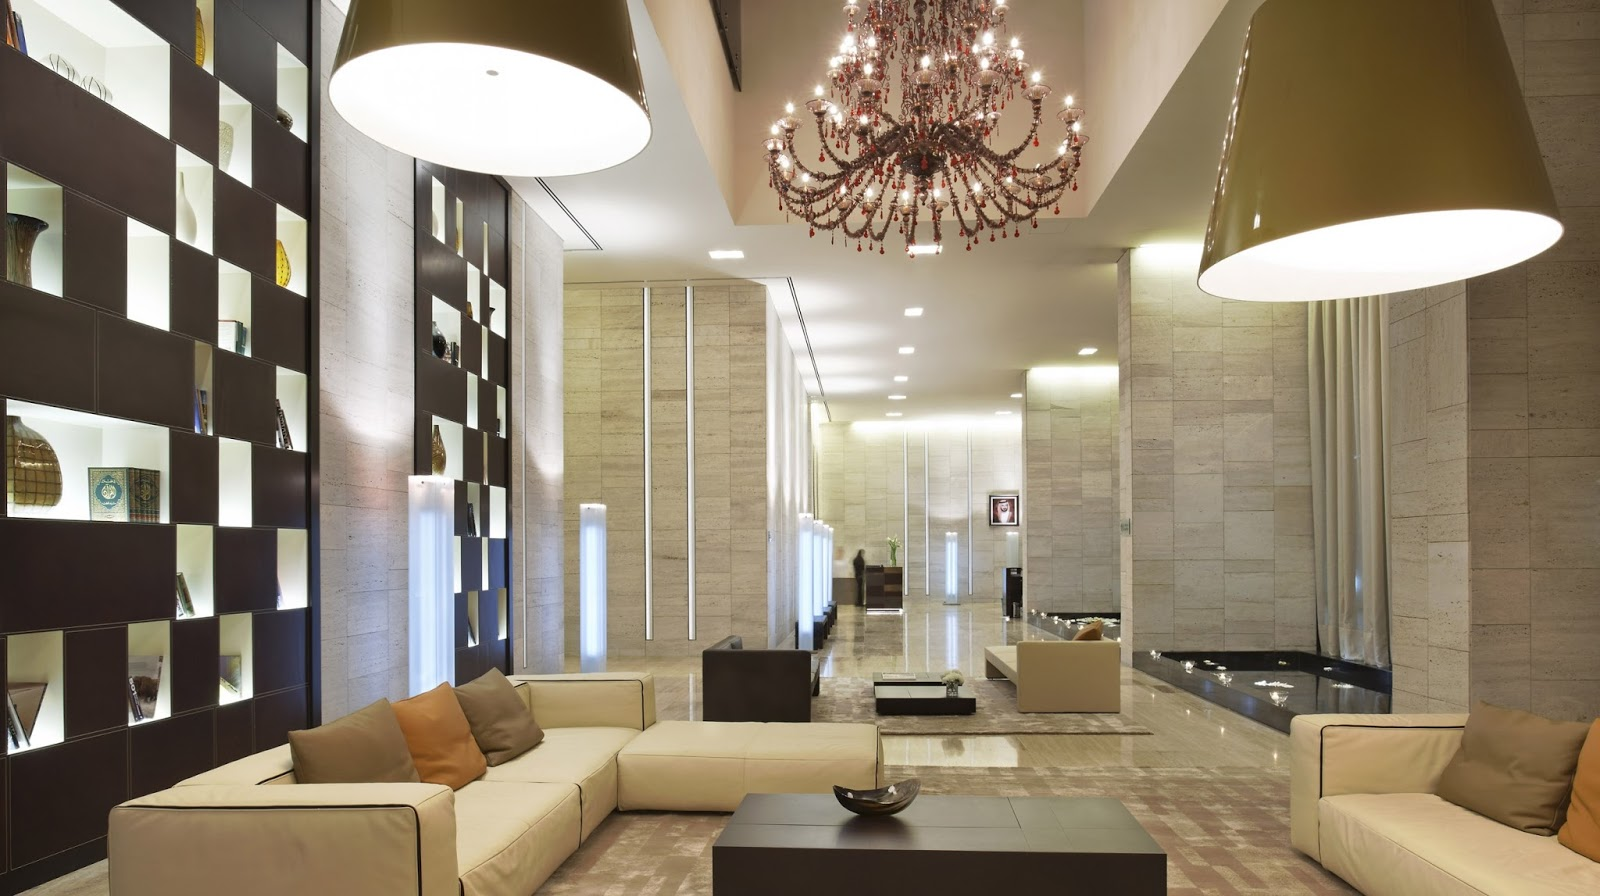 Interior Design Firms Hotel Interior Design Firms Dubai  Psoriasisguru